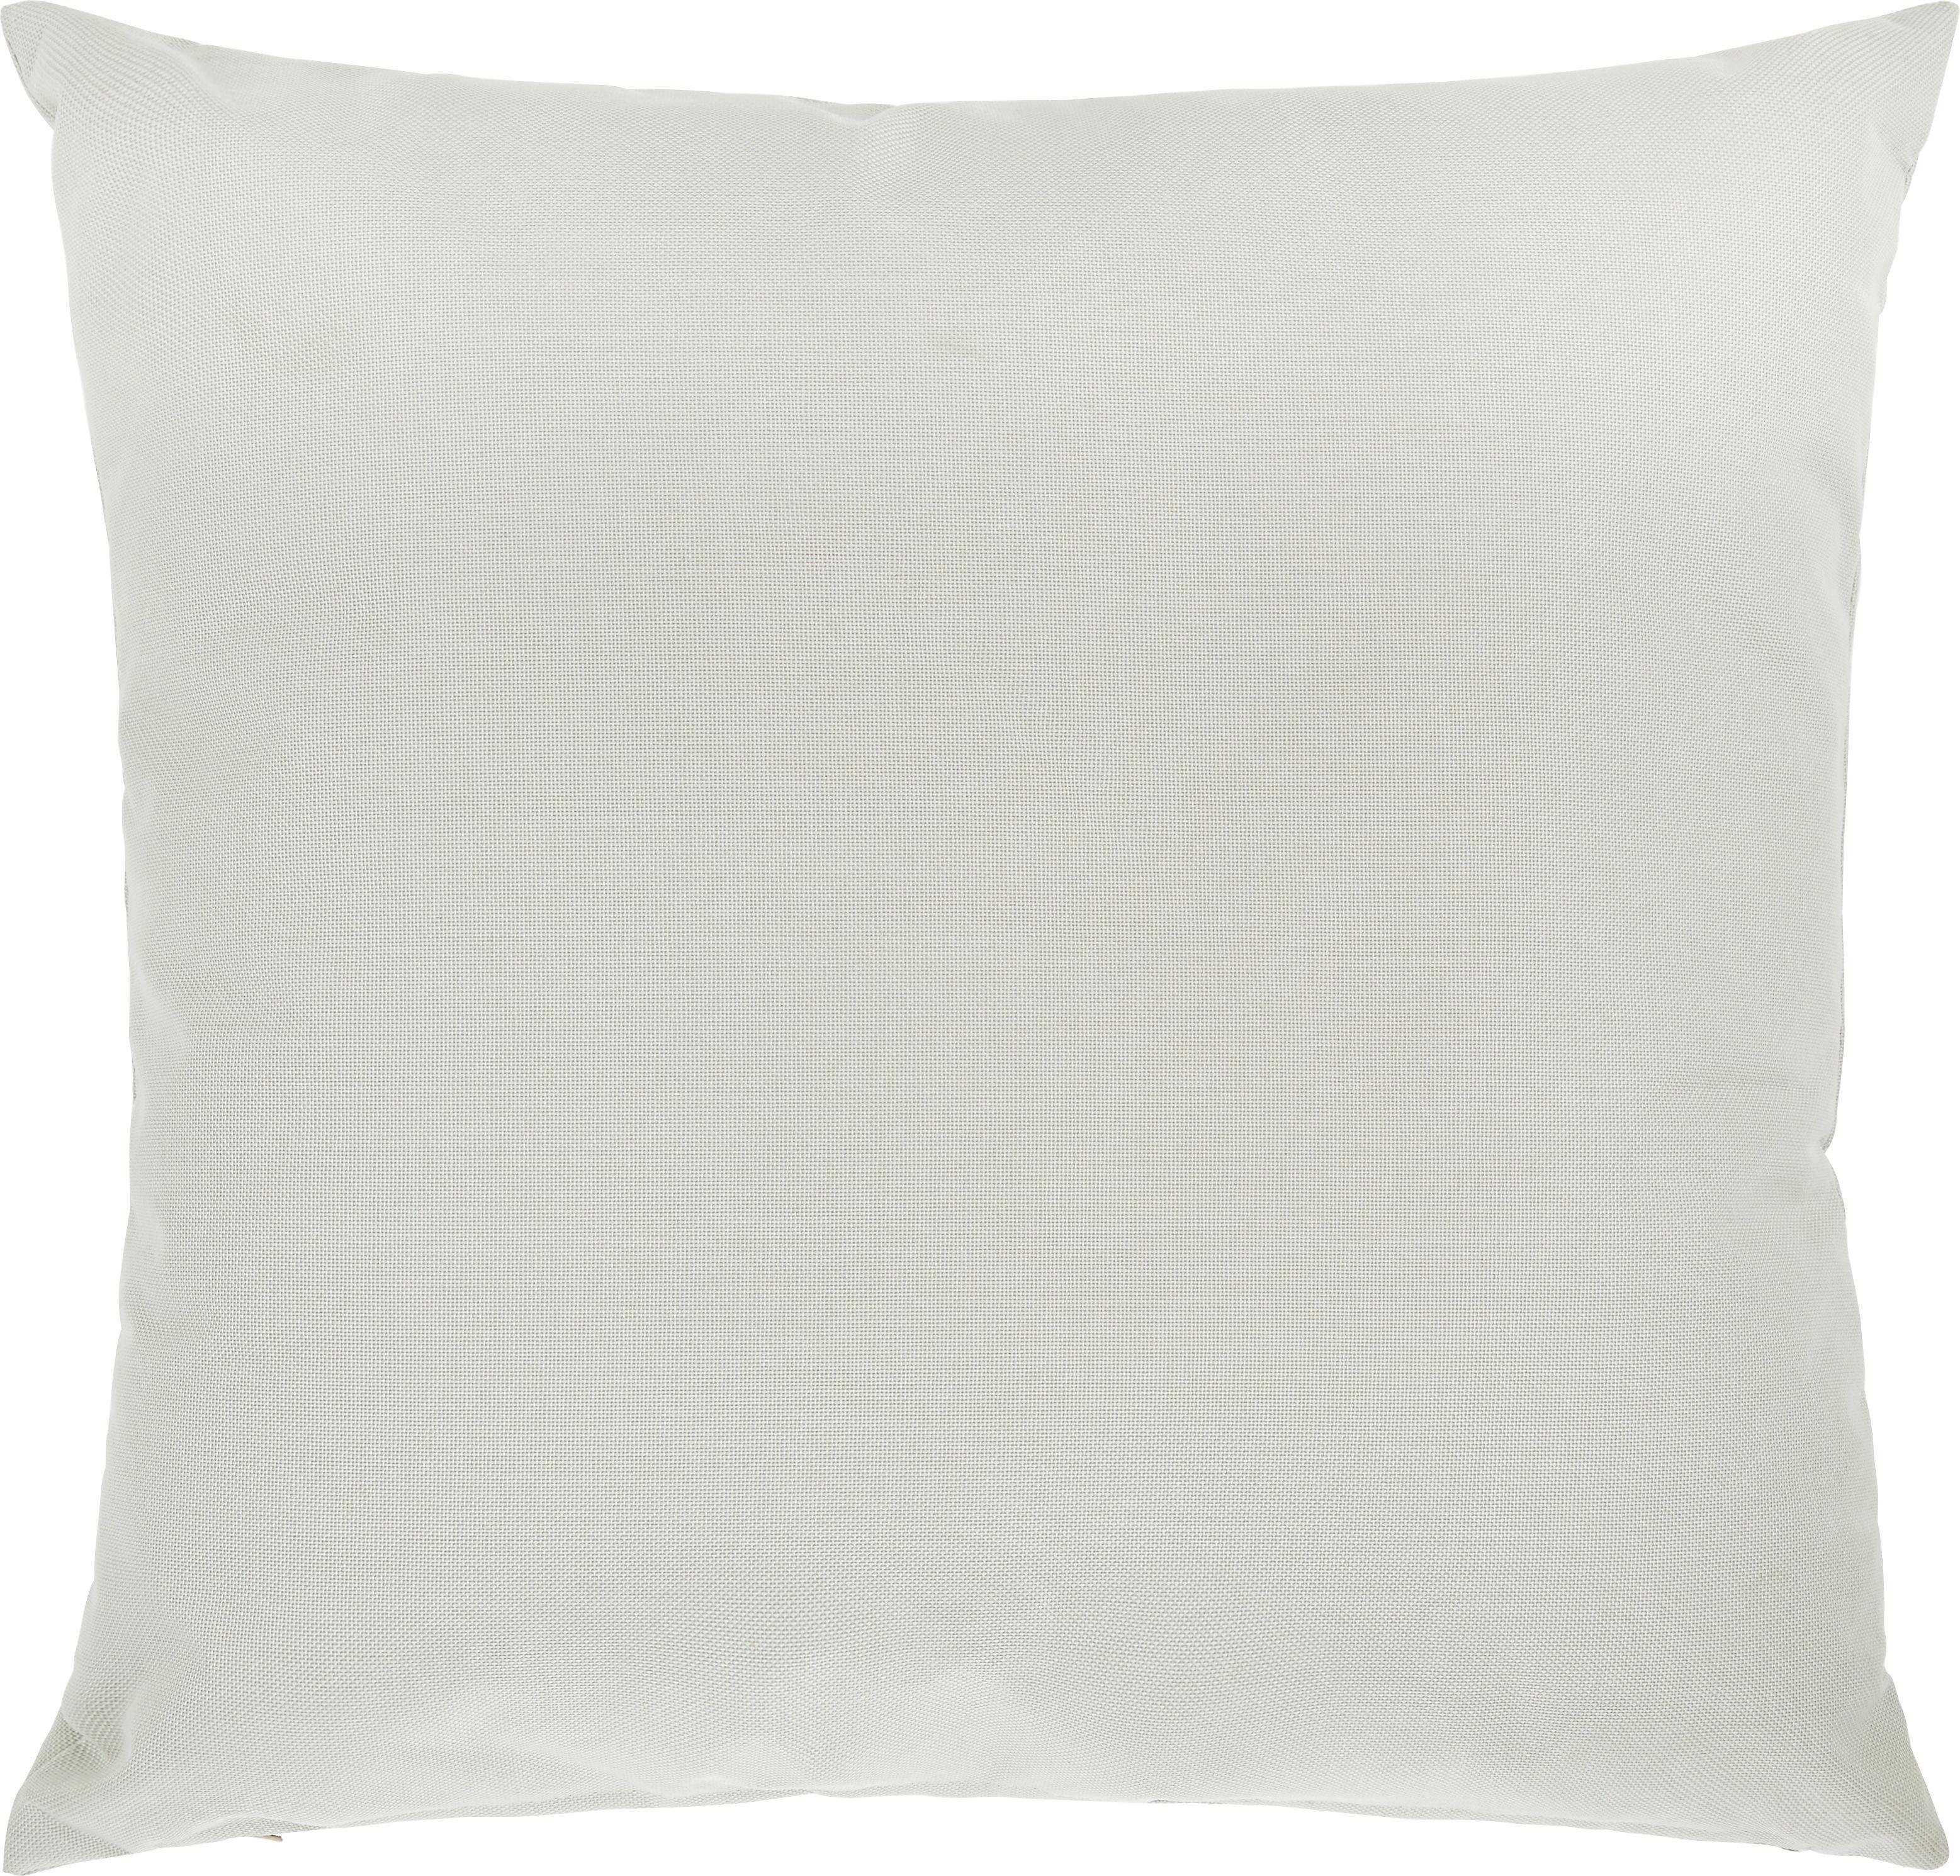 Outdoorkissen Carat 45x45cm - Hellgrau, MODERN, Textil (45/45cm) - MÖMAX modern living